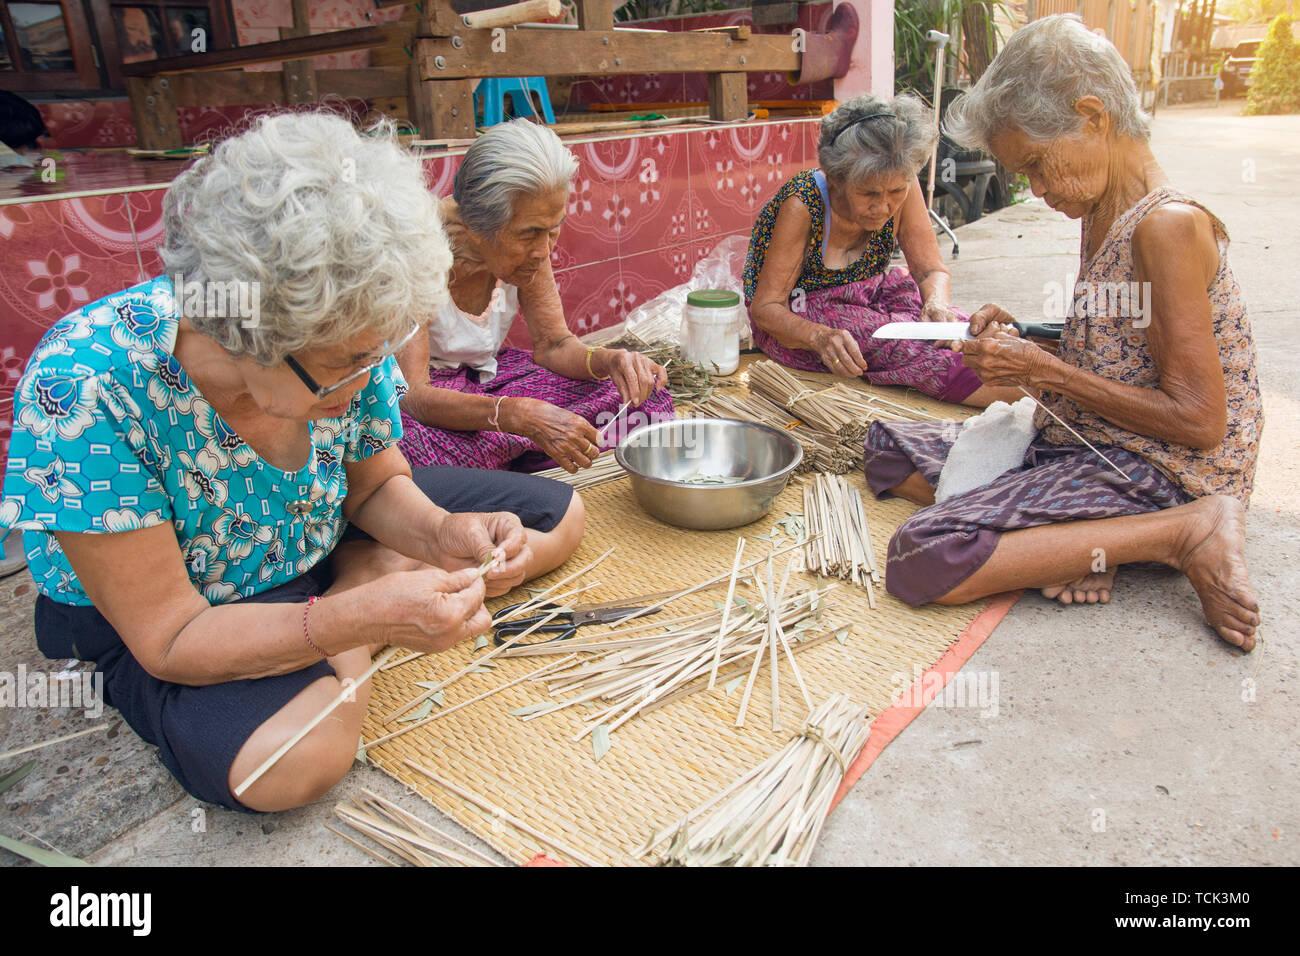 NAKHON PHANOM, THAILAND - Mar 25, 2019 : Group Senior Woman manually weaving bamboo. - Stock Image